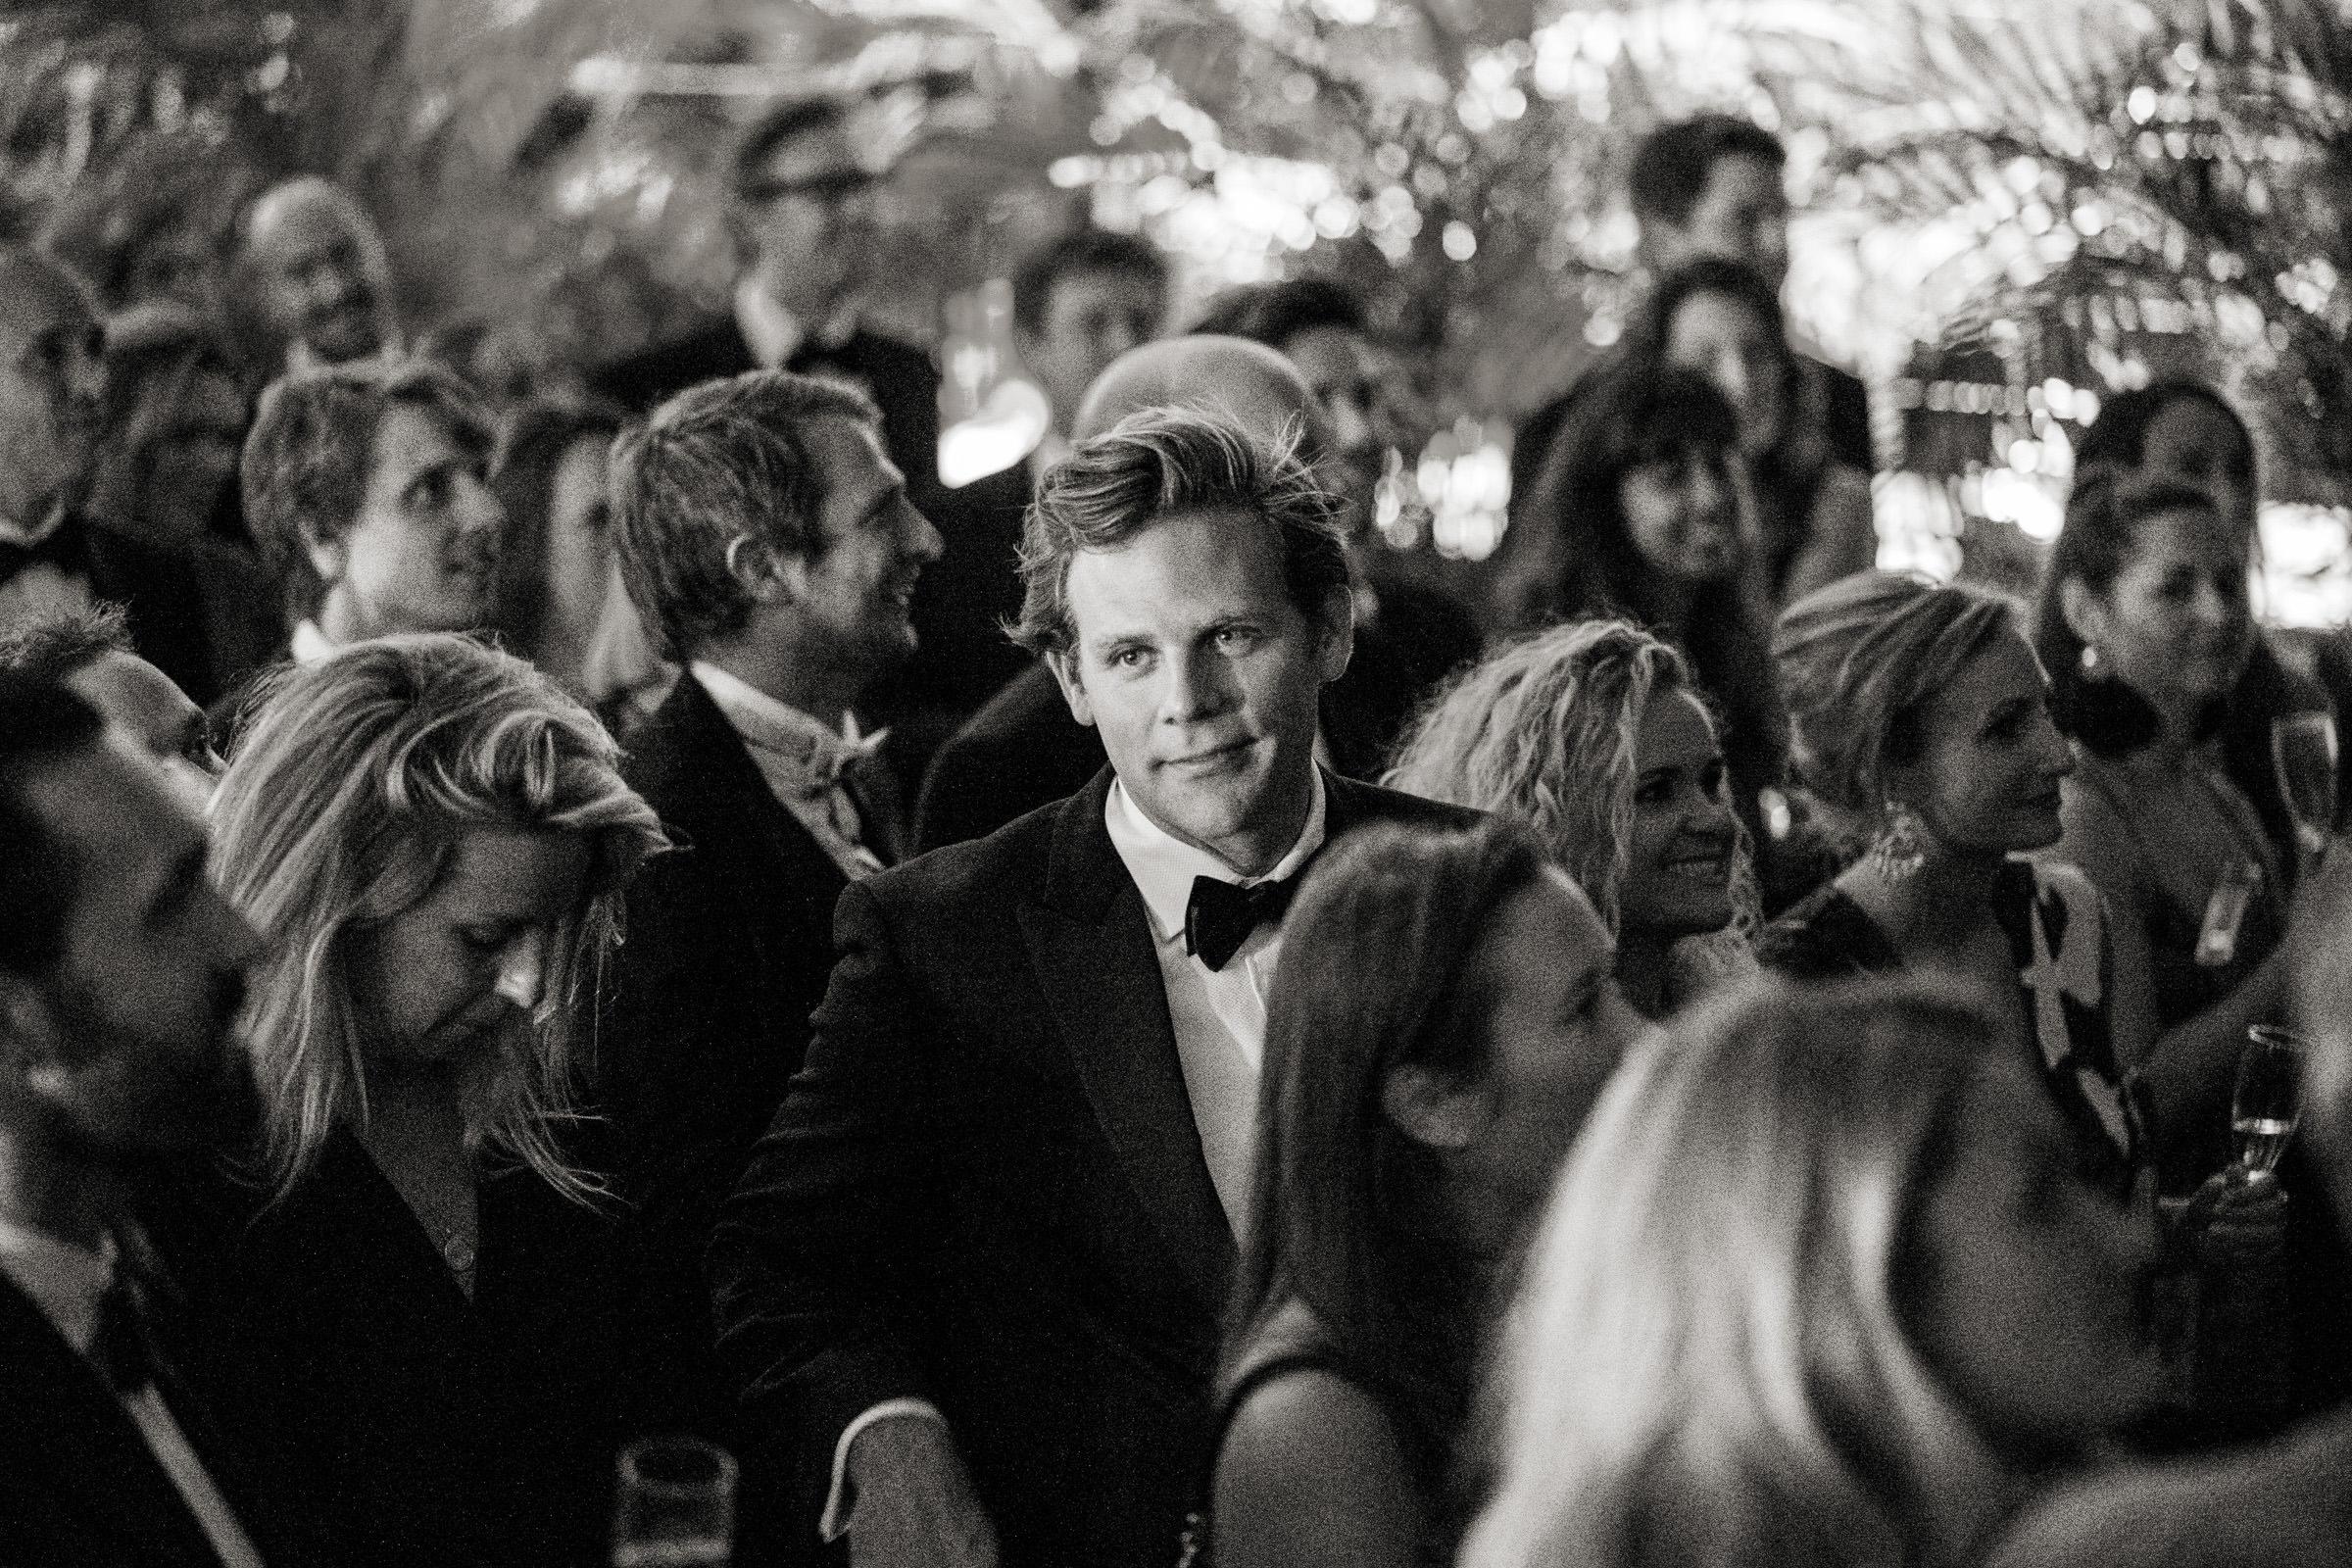 barbican london wedding photography 024.jpg